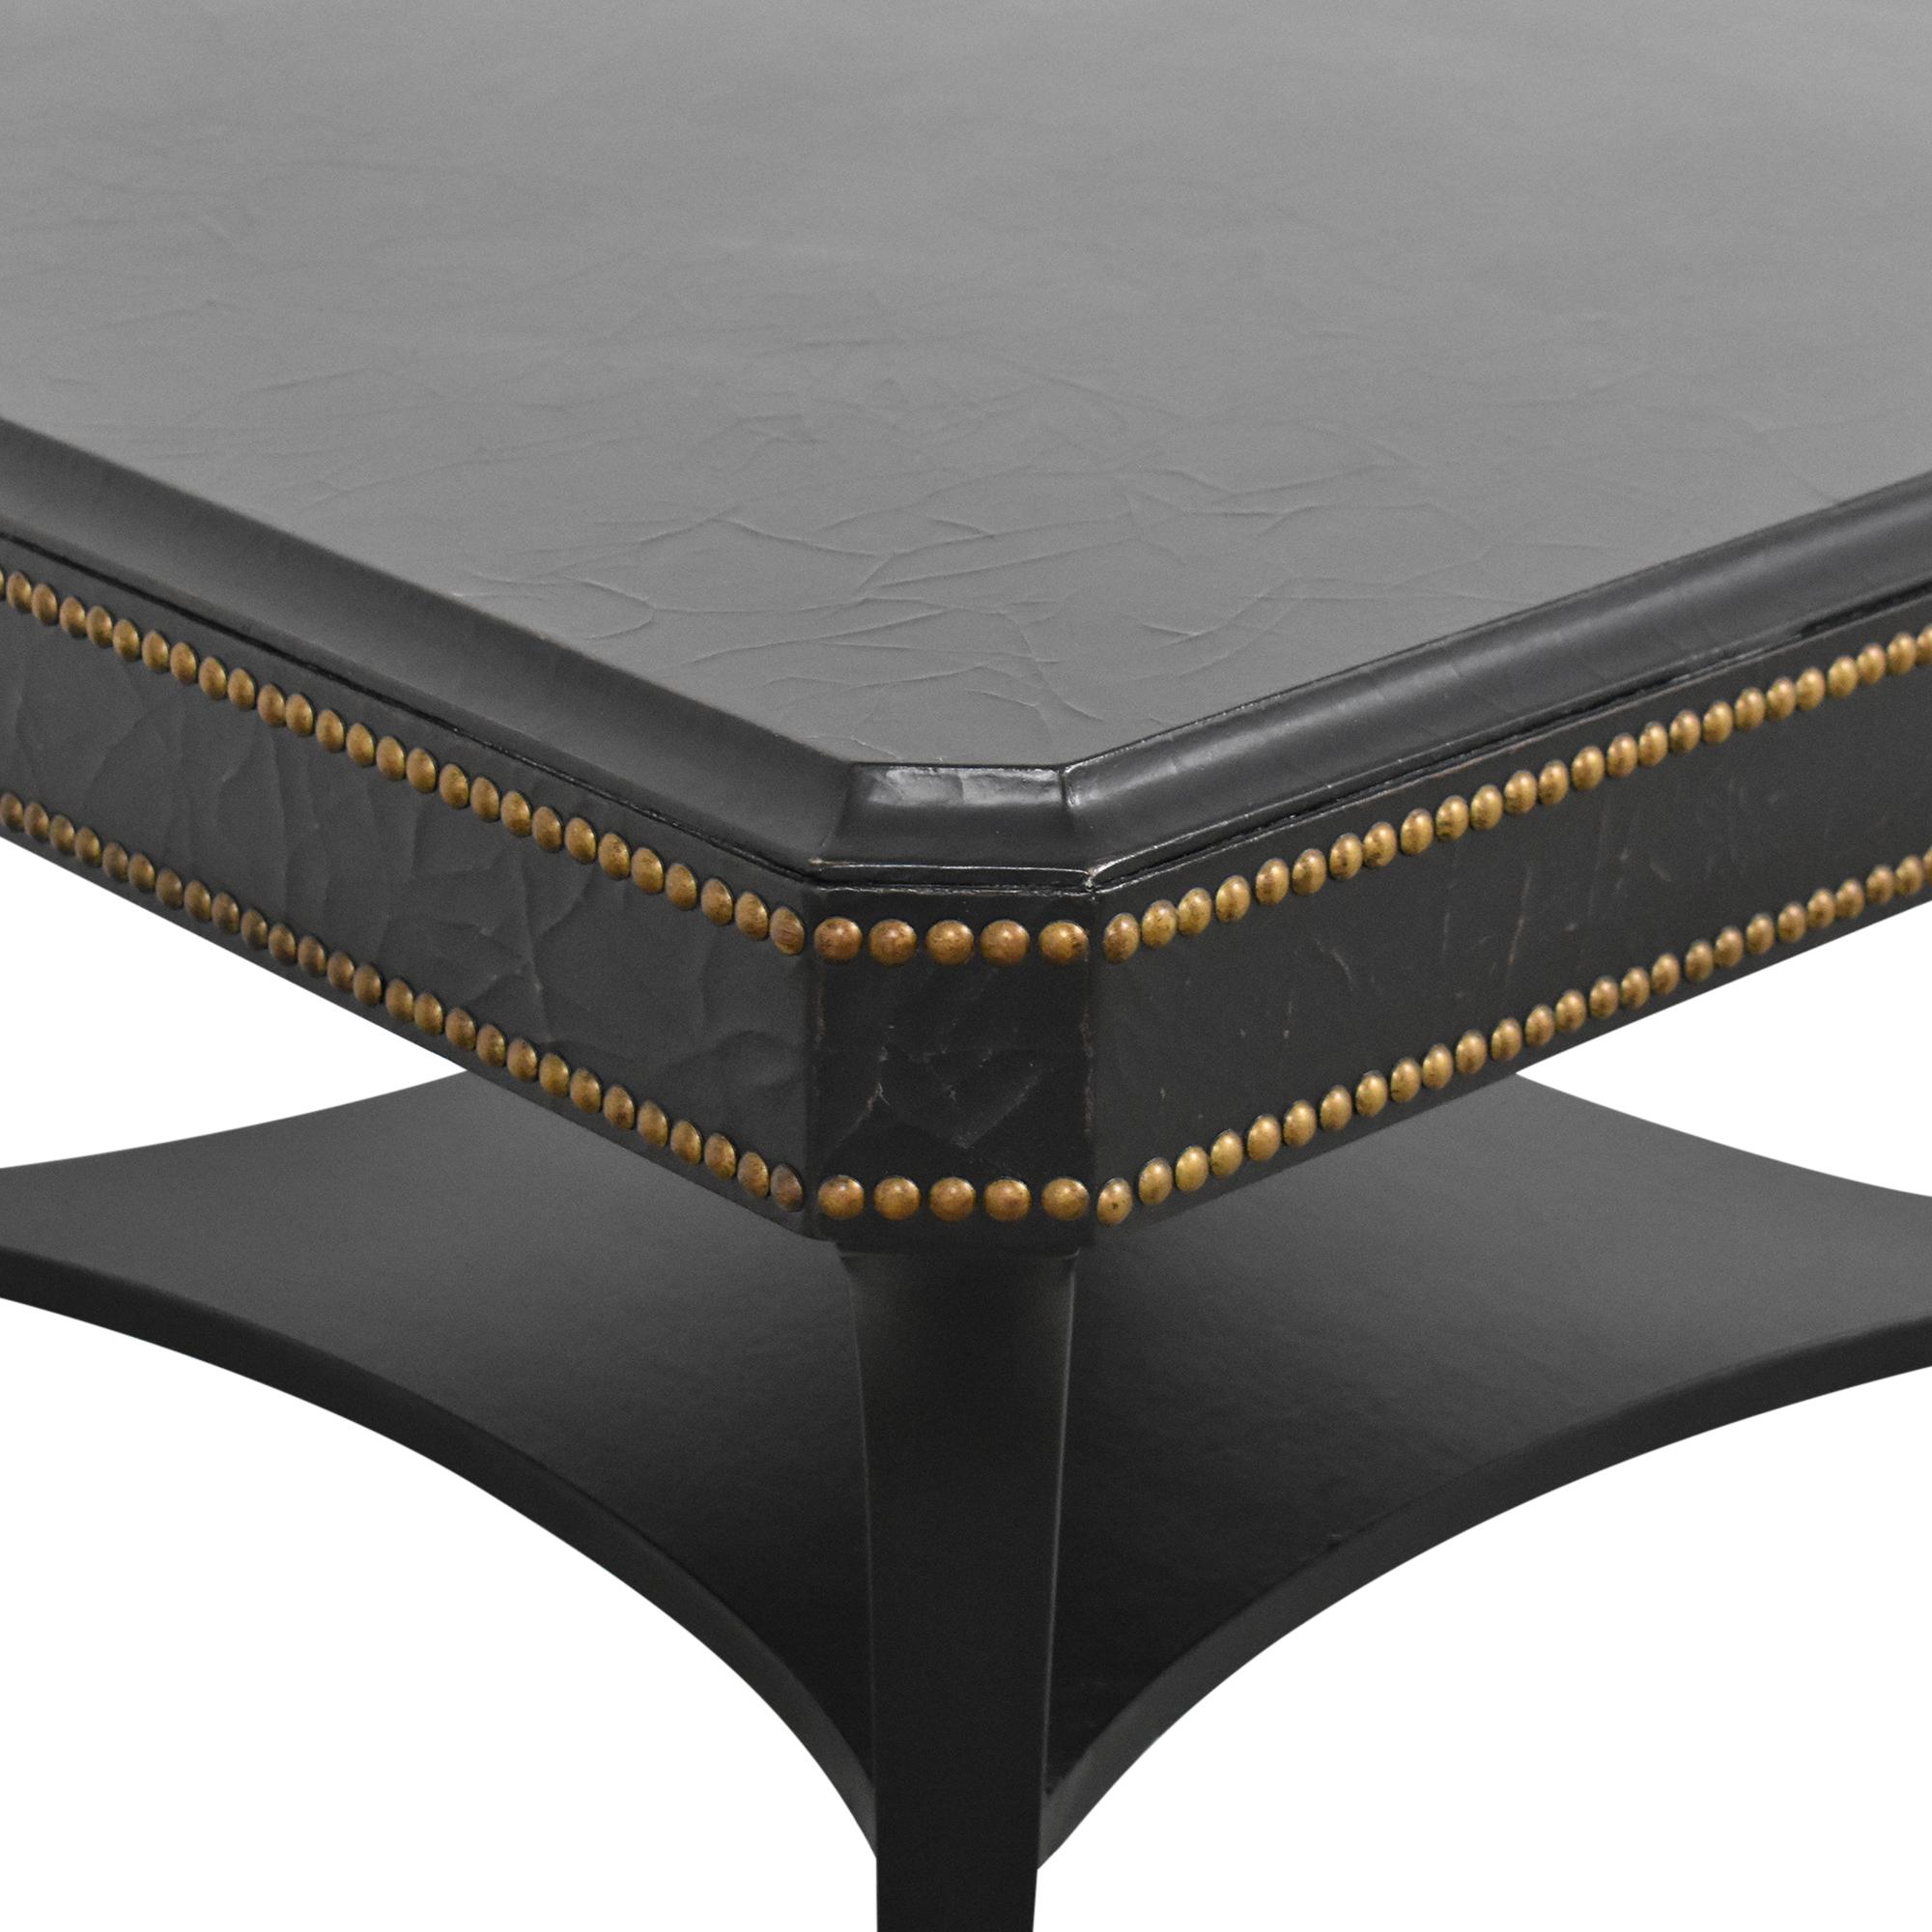 Ethan Allen Everett End Table / Tables